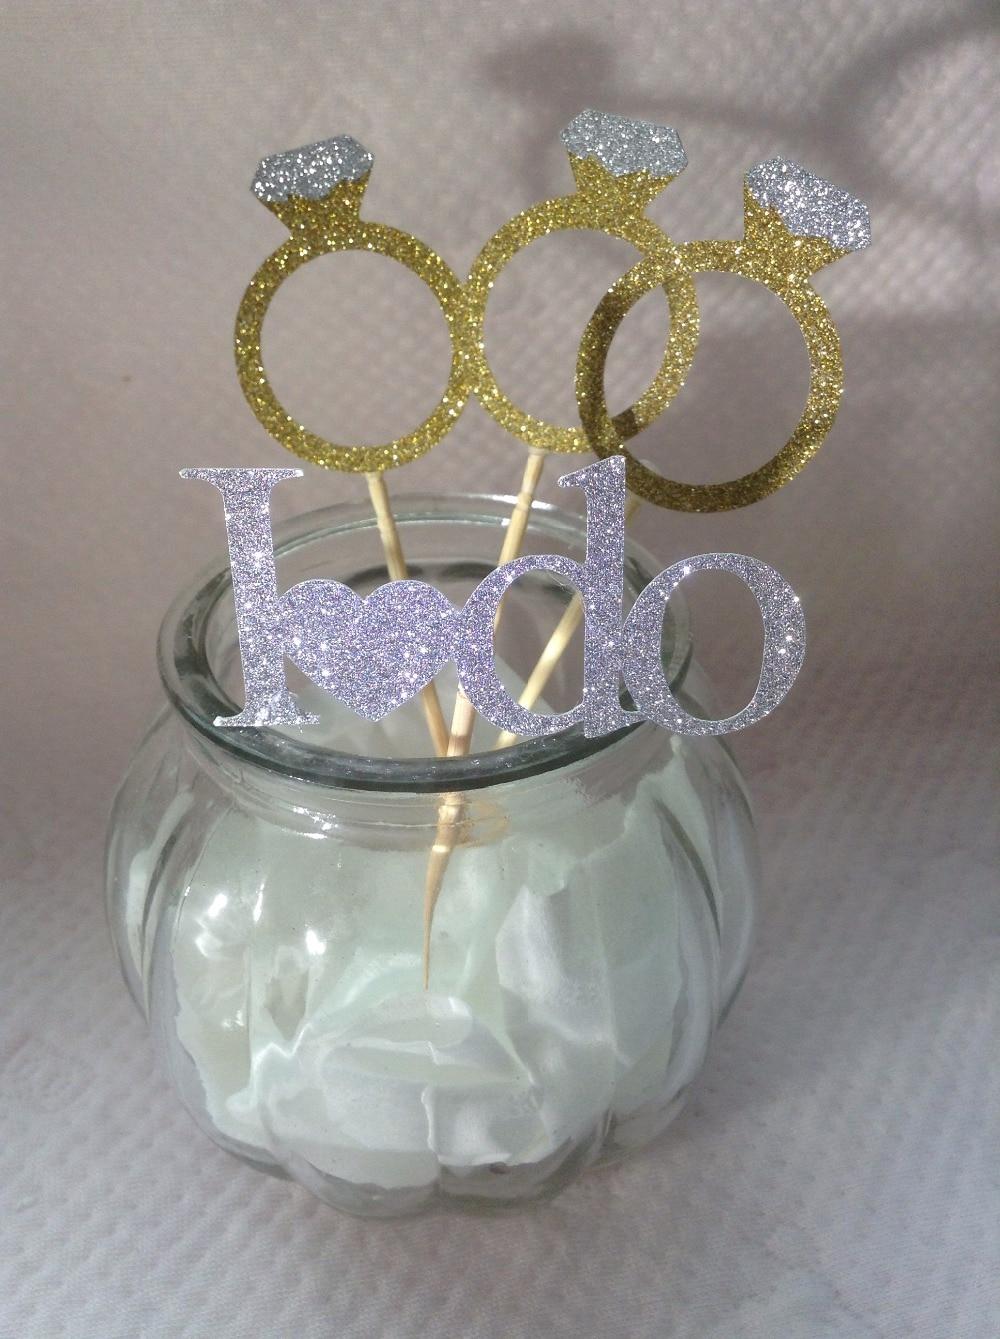 wedding ring cake toppers wedding ring cake topper Wedding ring cake toppers Diamond Ring Cake Topper Handmade Als